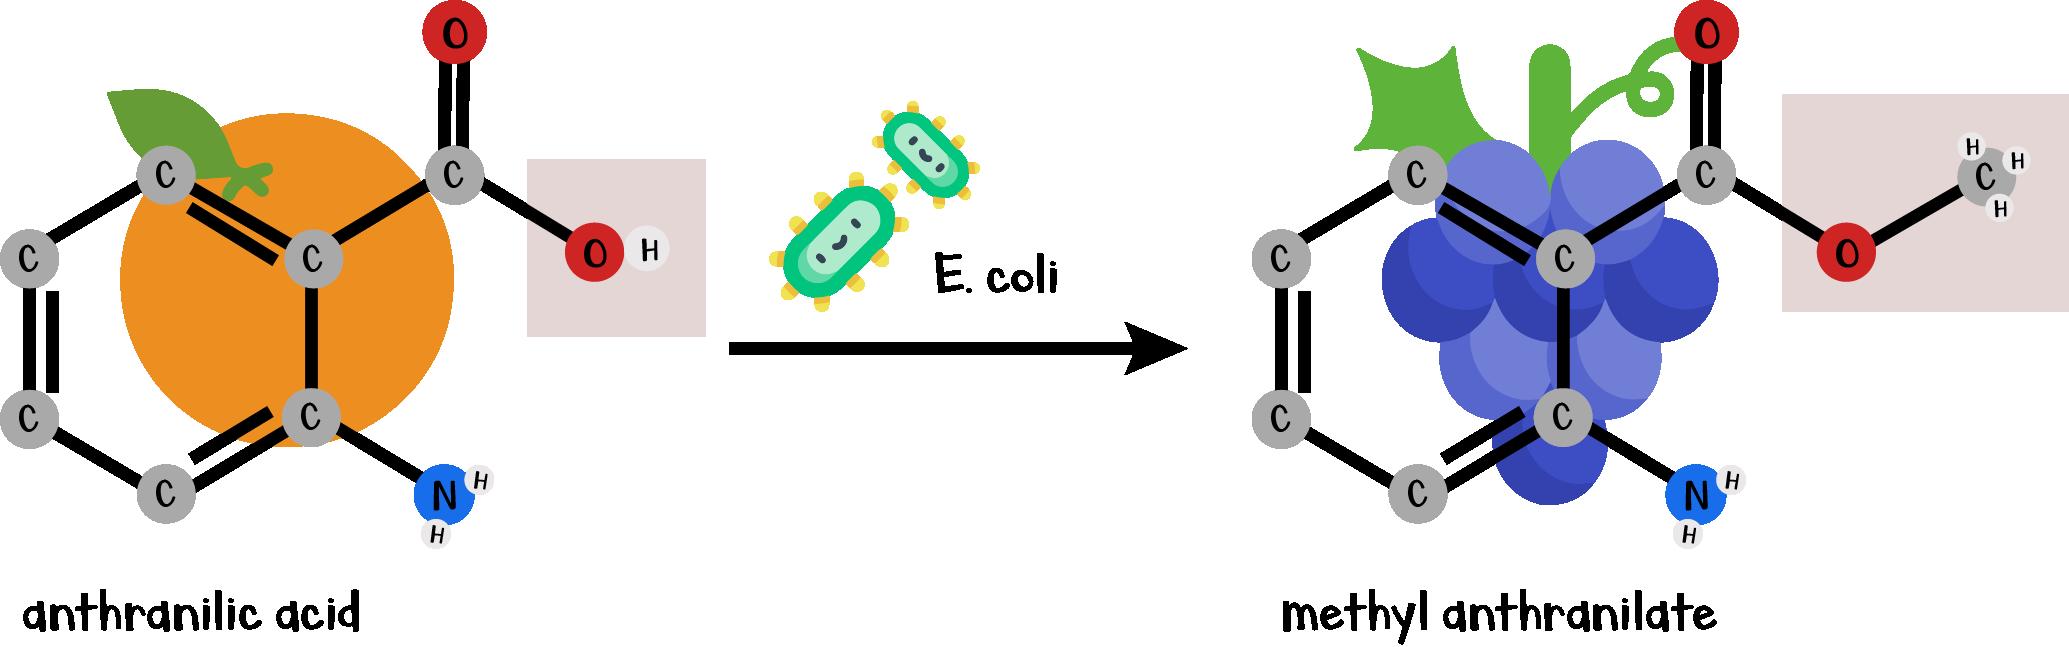 Conversion of anthranilic acid (orange flavor) to methyl anthranilate (grape flavor) using  E. coli